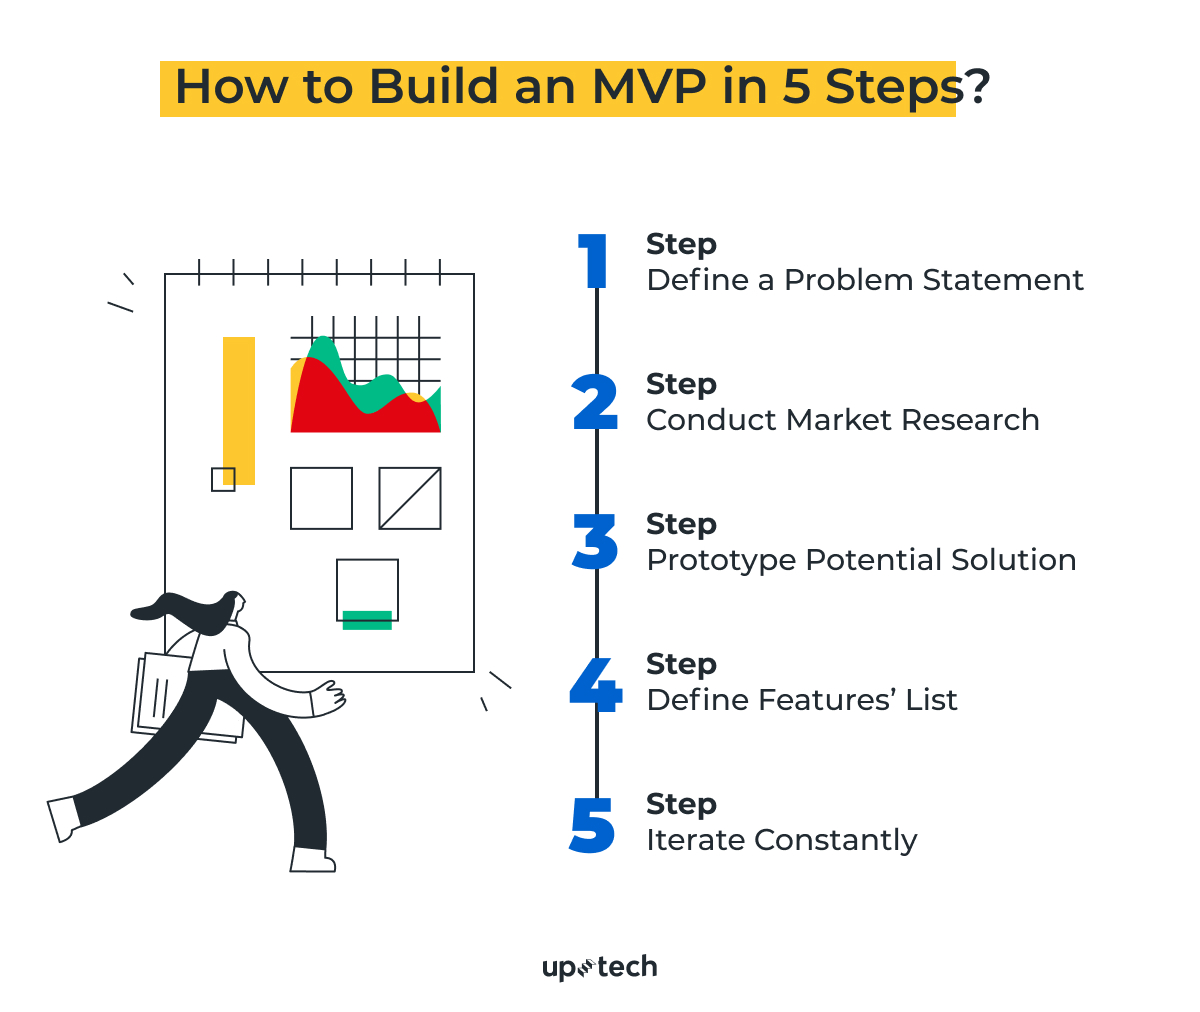 build an MVP